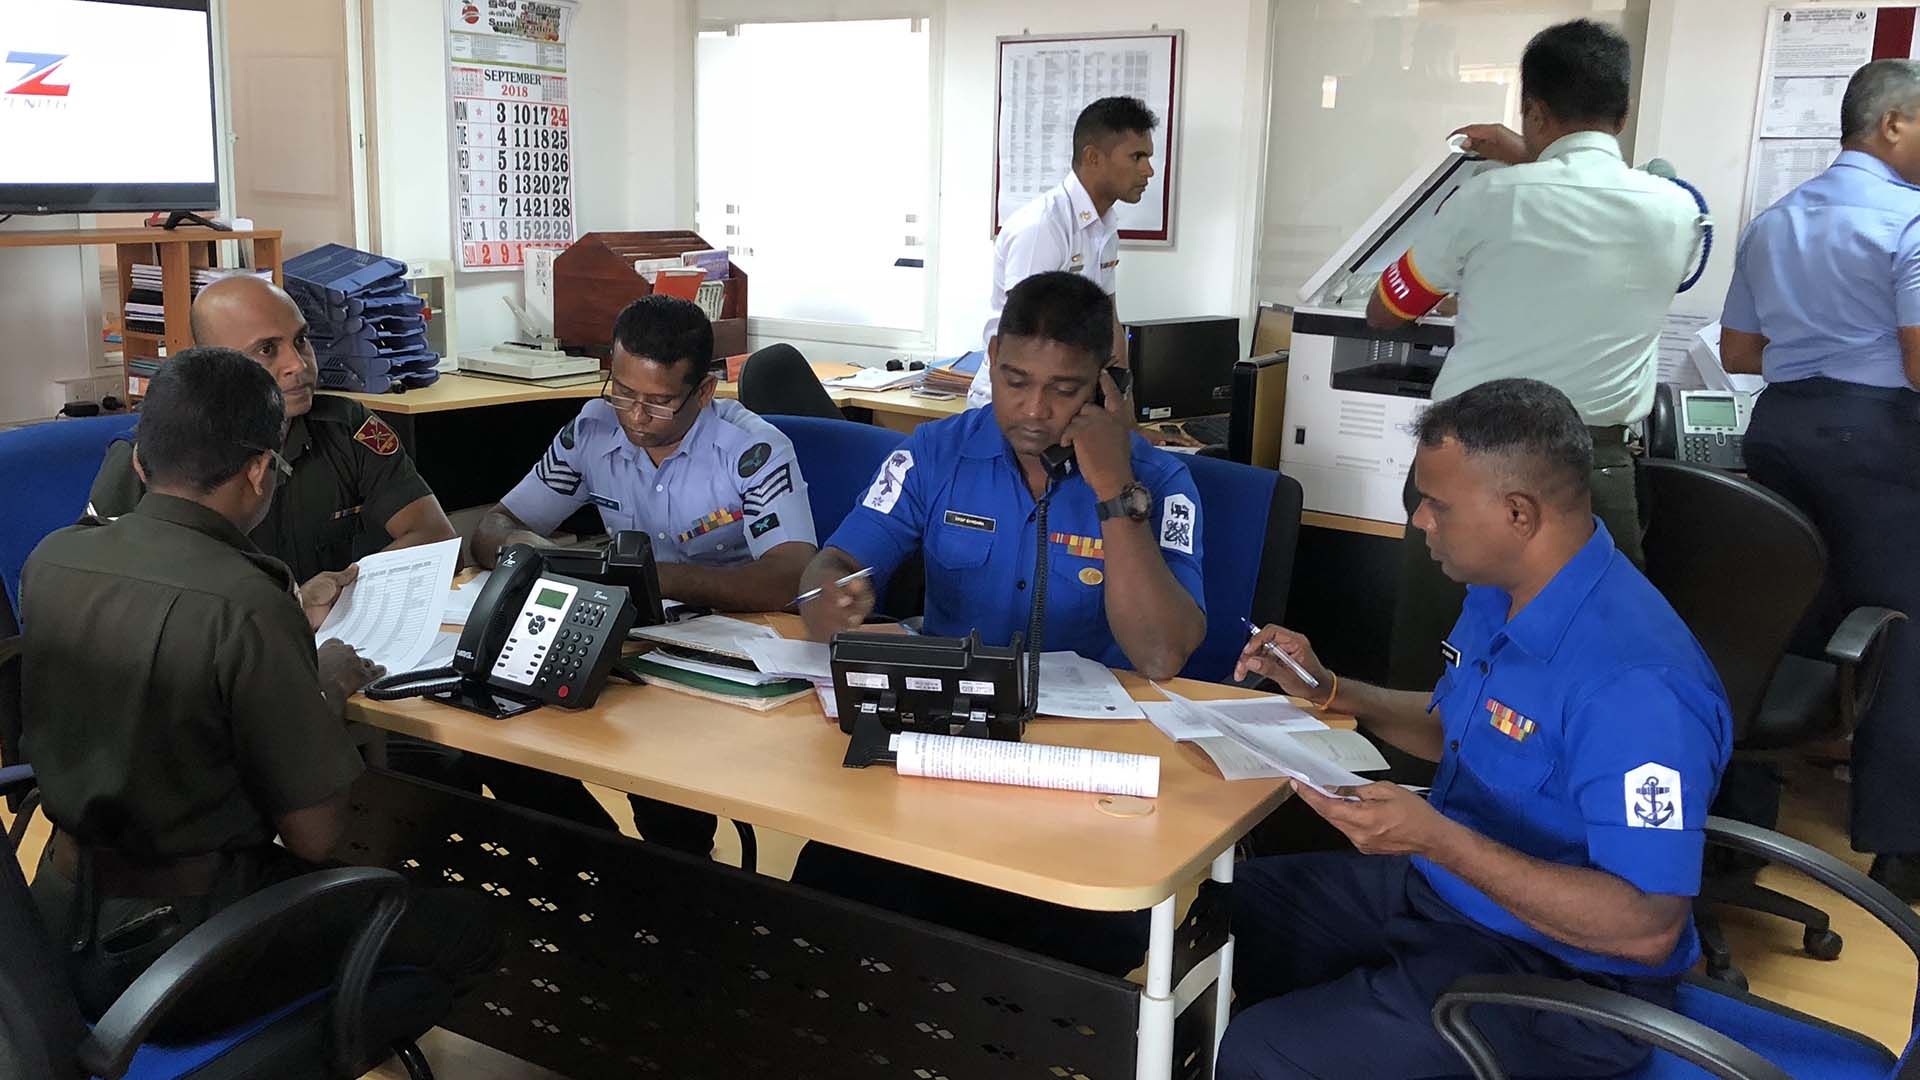 Sri Lanka Tsunami Warning System Test Staff